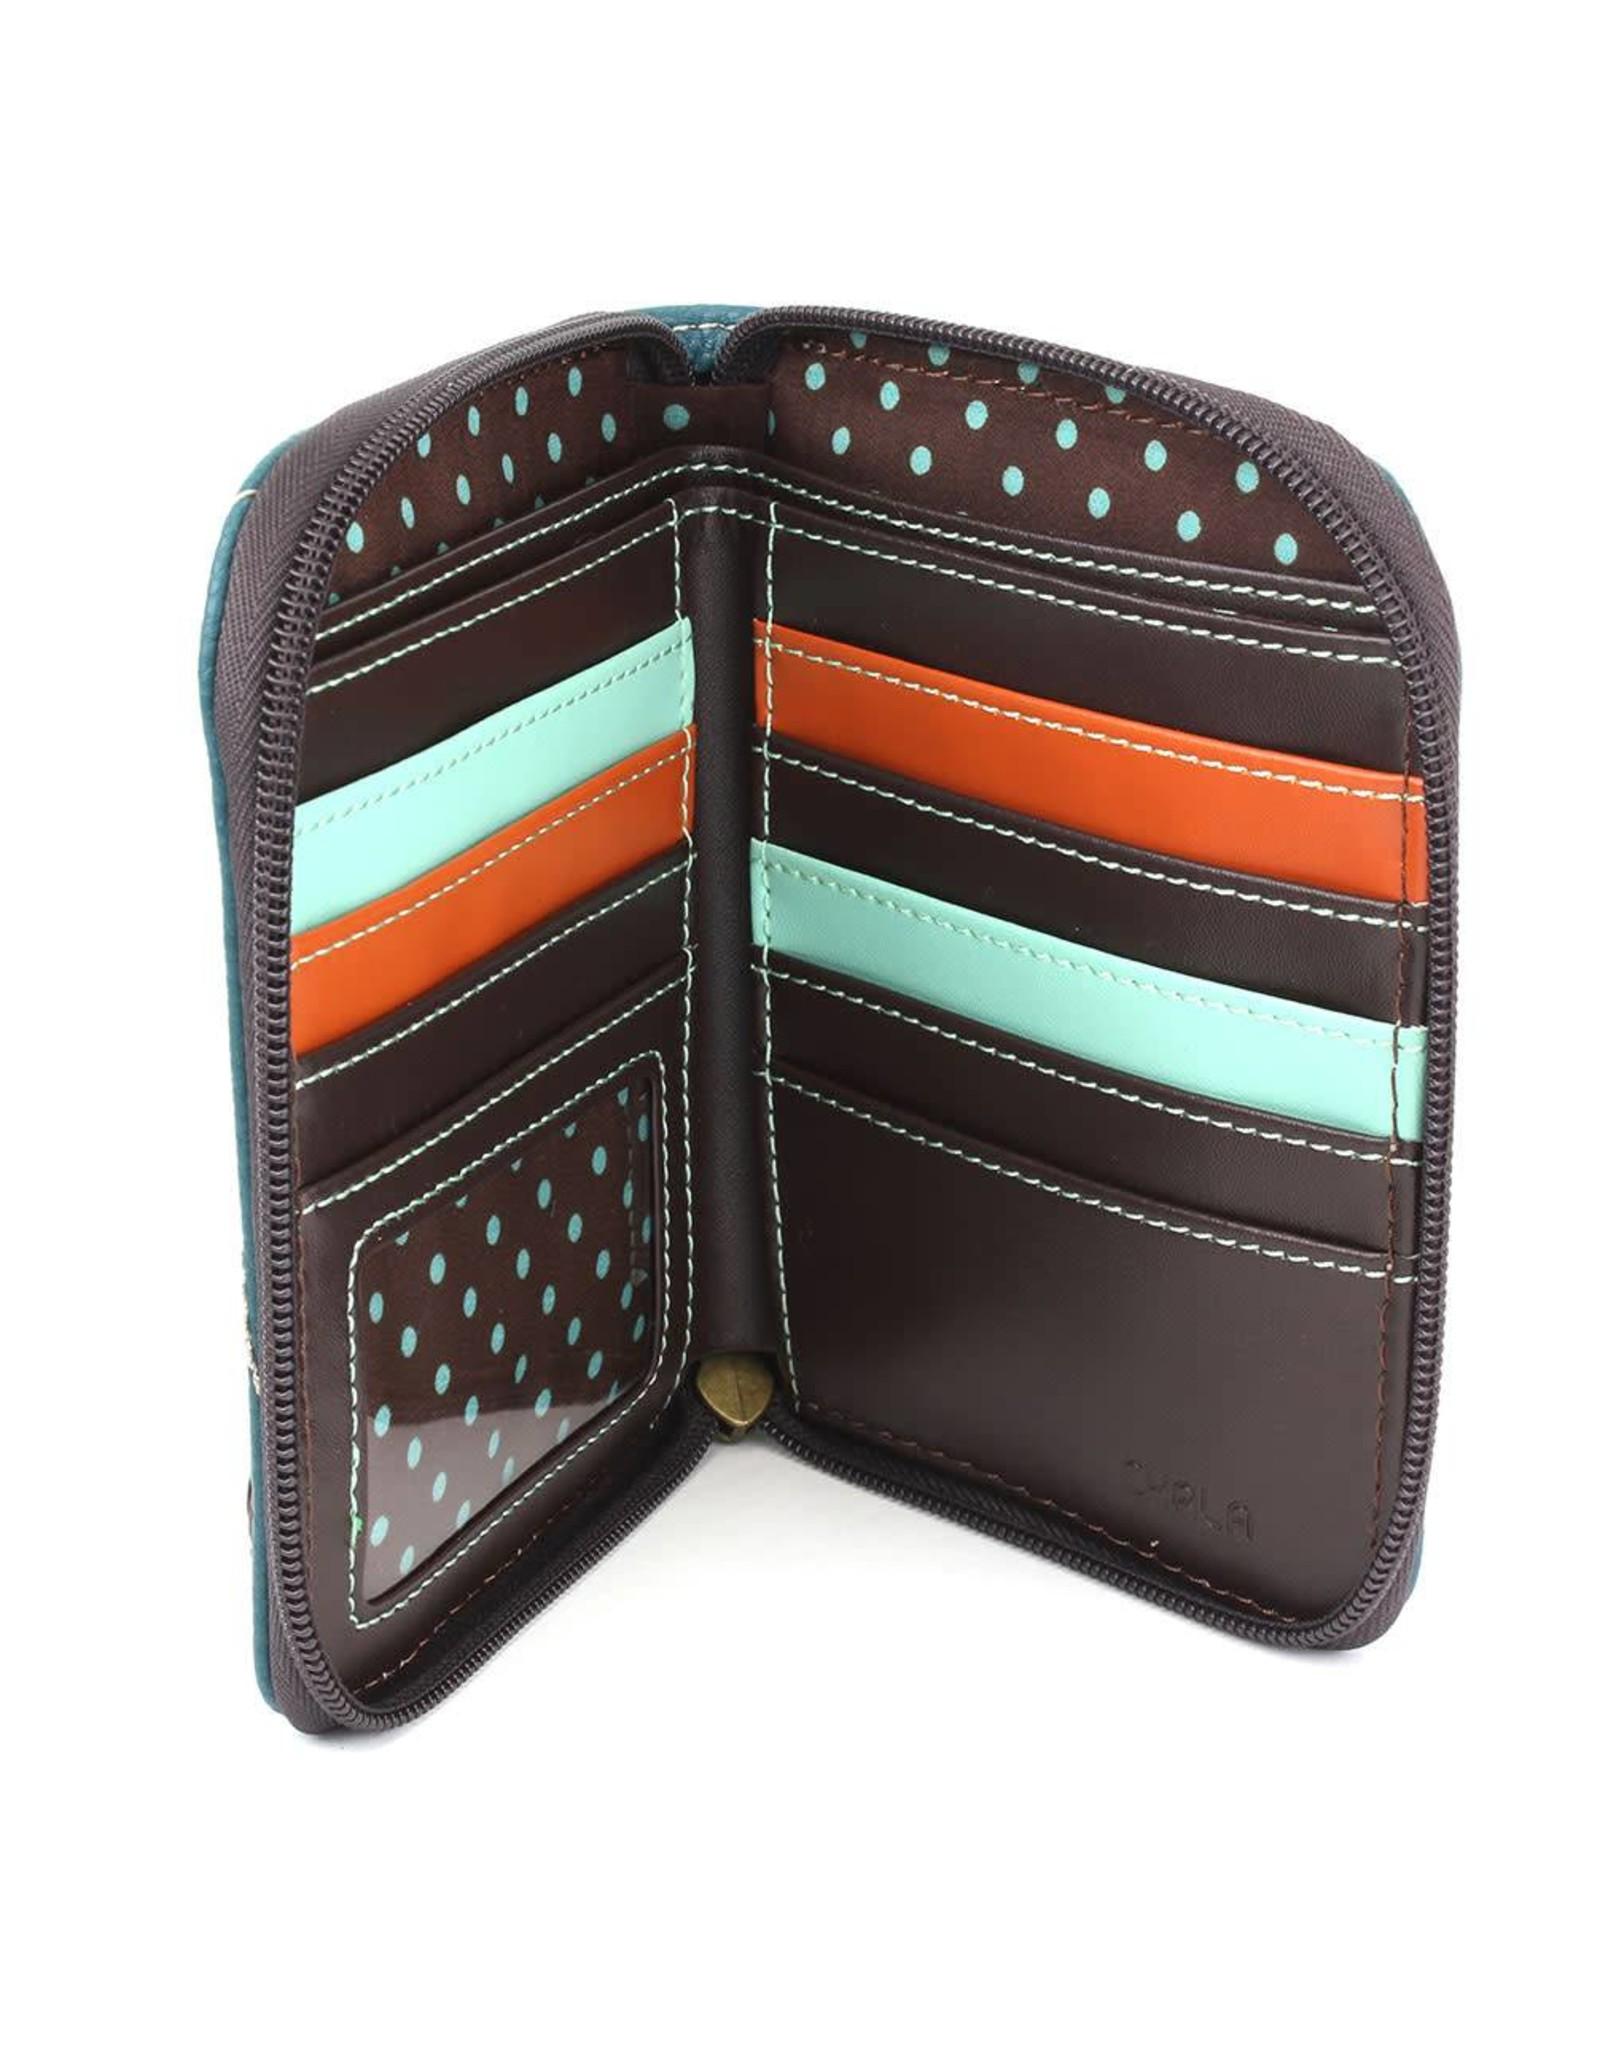 Womens Wallets & Wristlets - Small Zip Around Wallet In